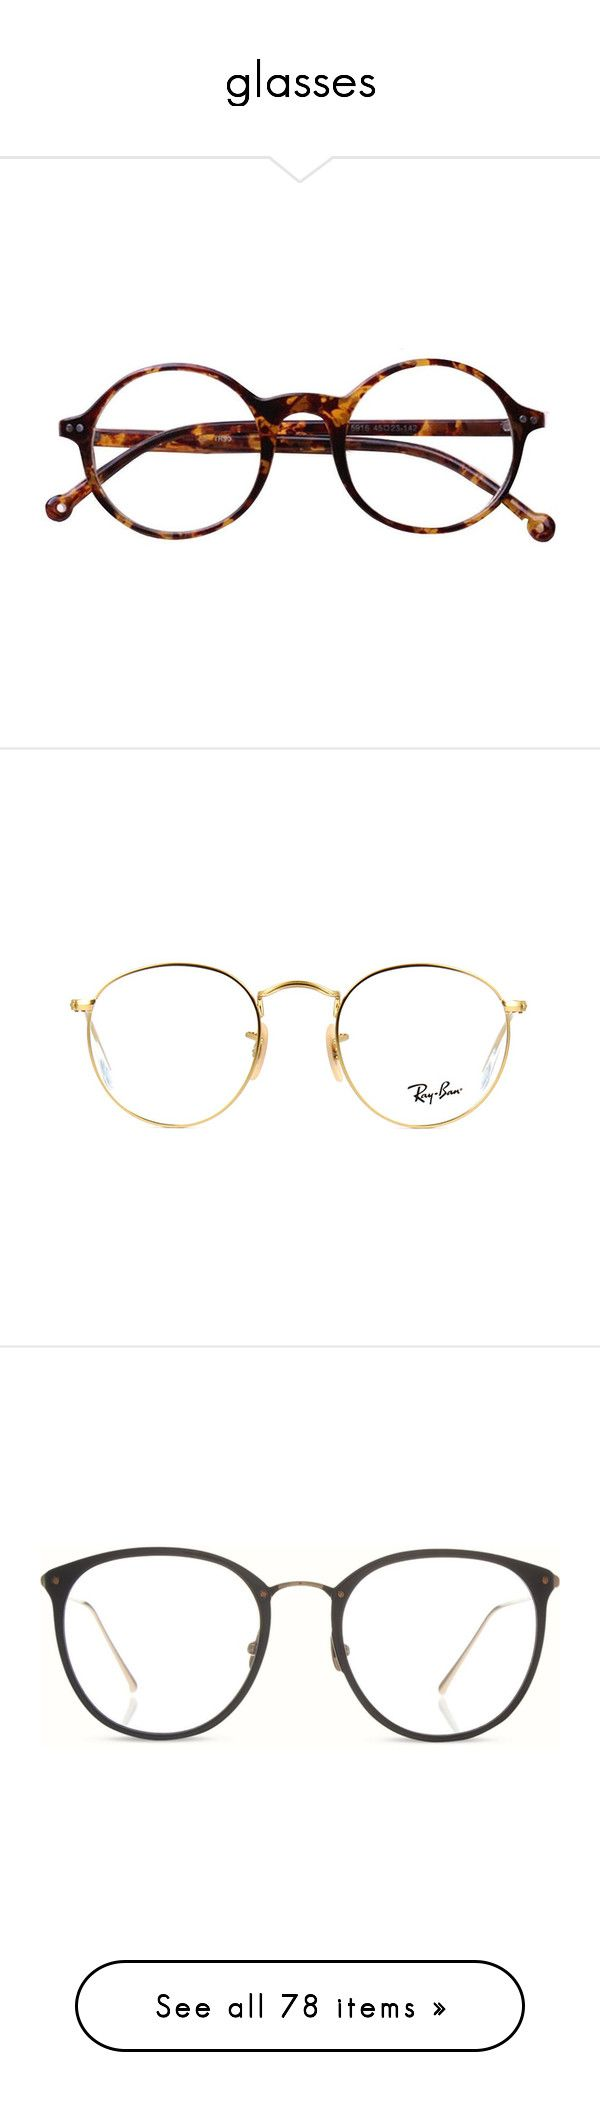 """glasses"" by sabina-127 ❤ liked on Polyvore featuring accessories, eyewear, eyeglasses, glasses, sunglasses, fillers, sport glasses, vintage eyeglasses, leopard print eyeglasses and round eyeglasses"